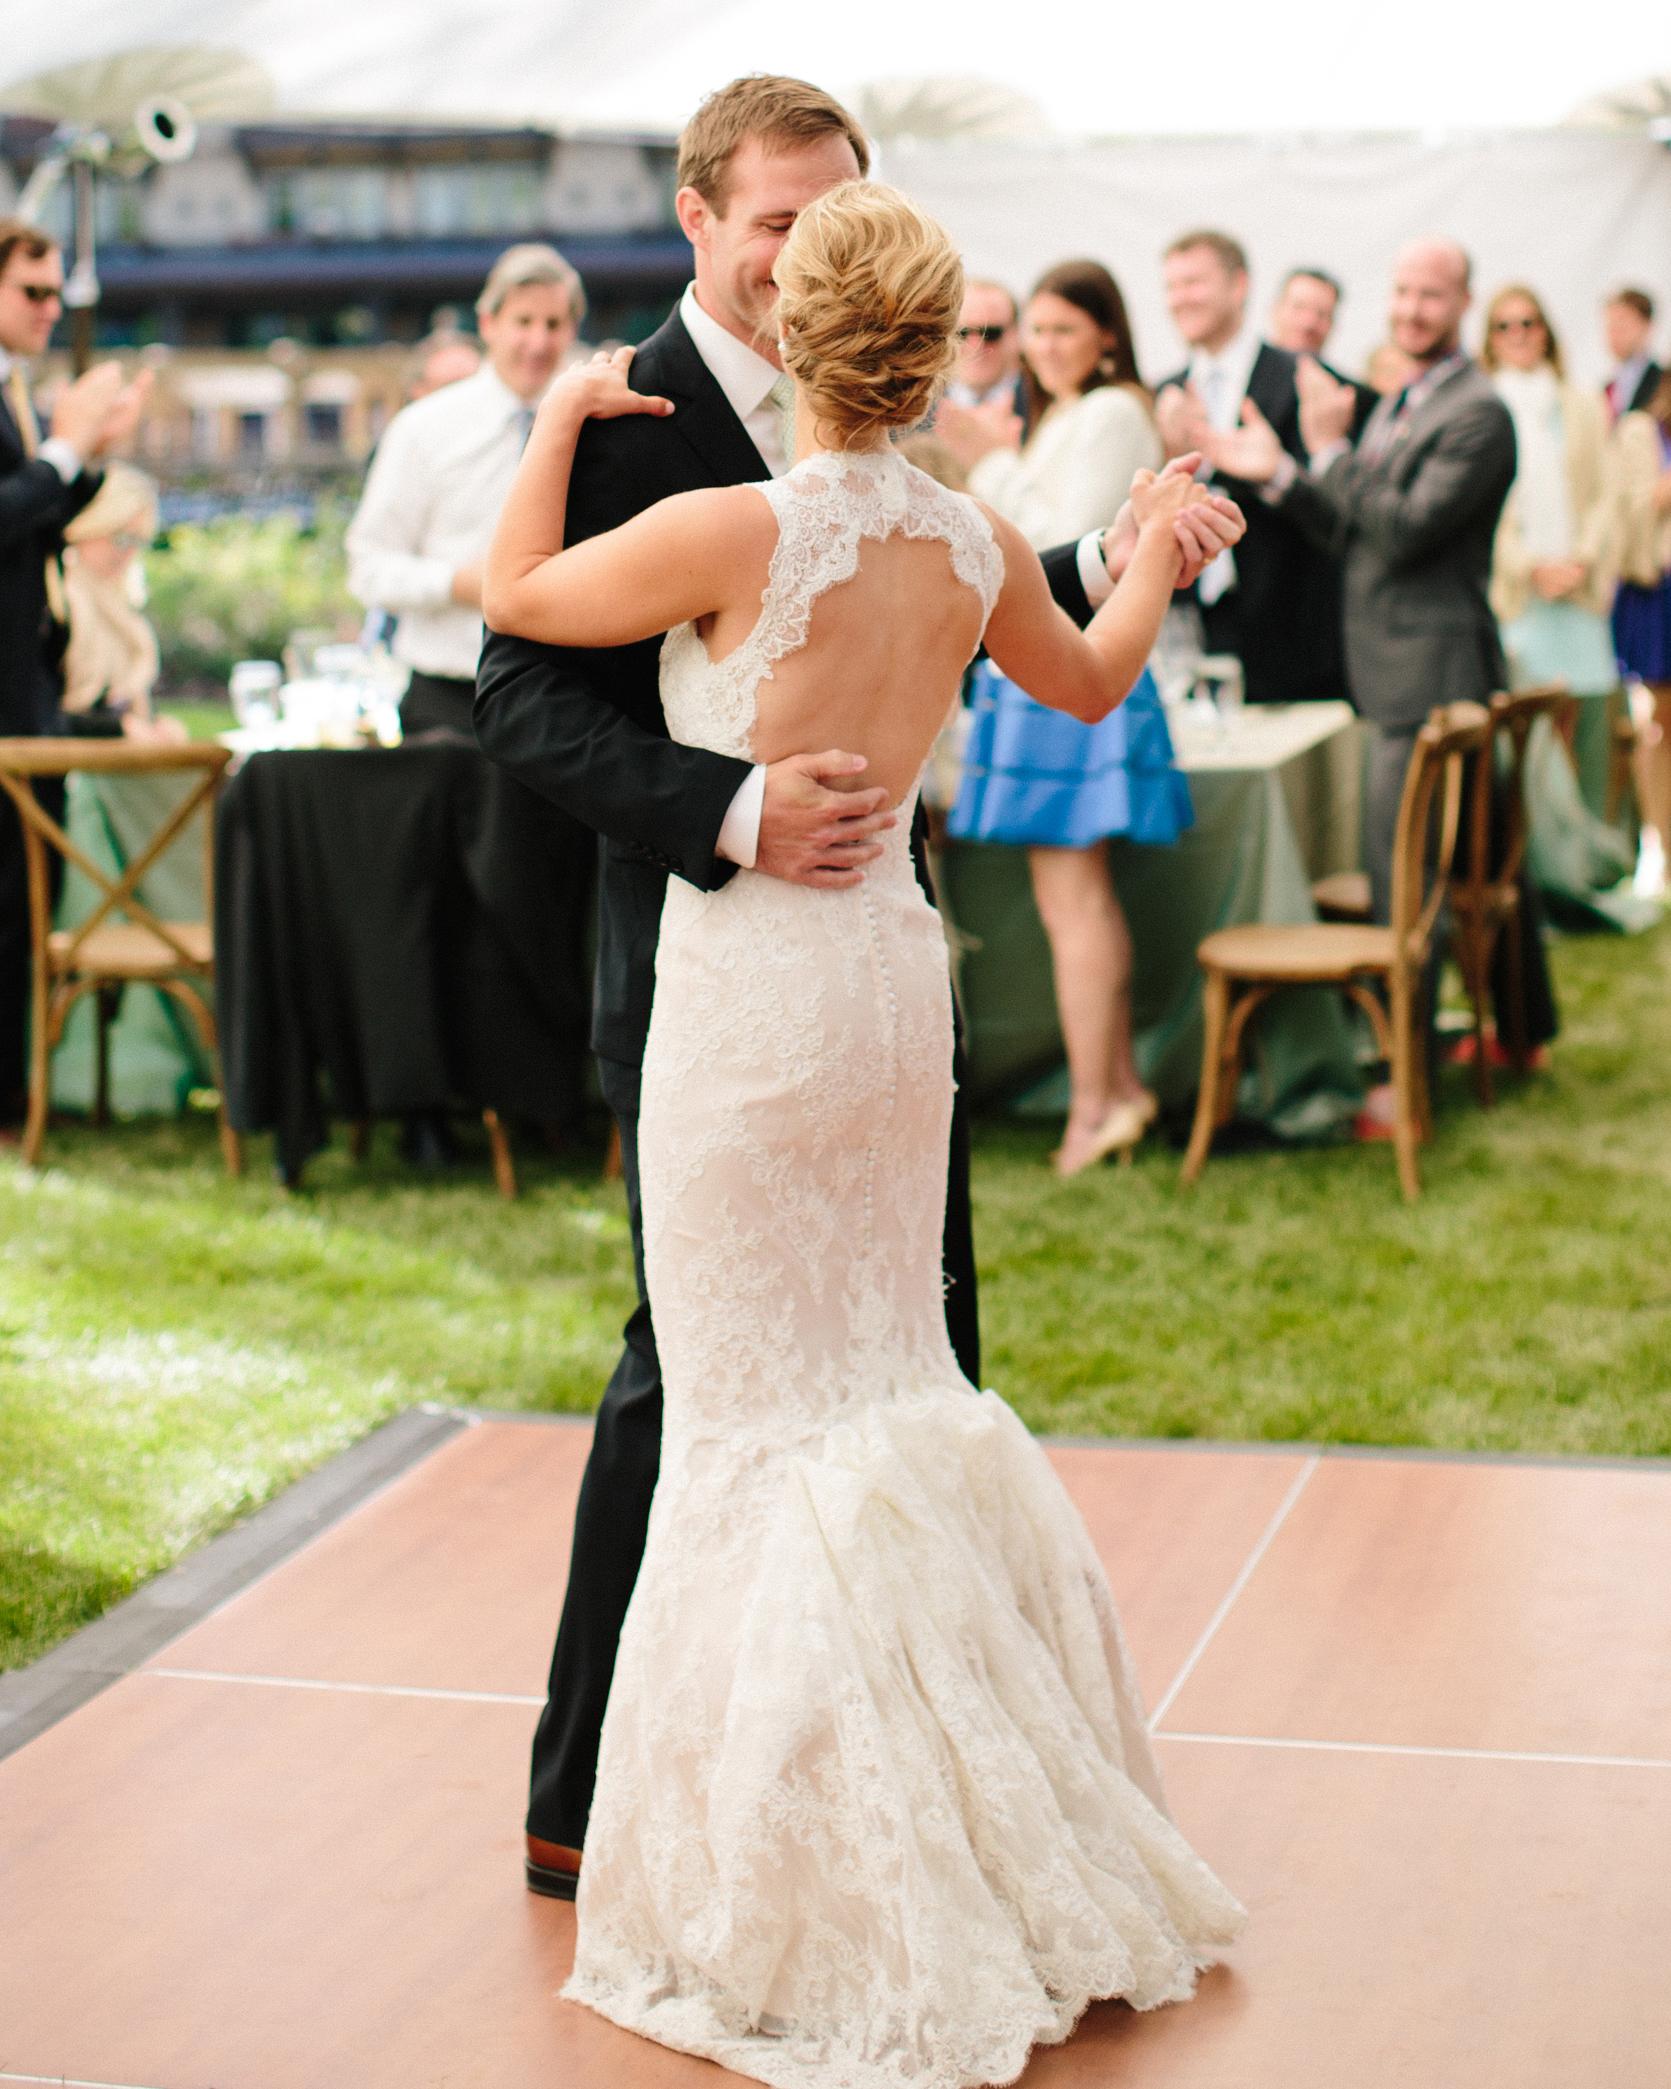 jamie-alex-wedding-dance-108-s111544-1014.jpg